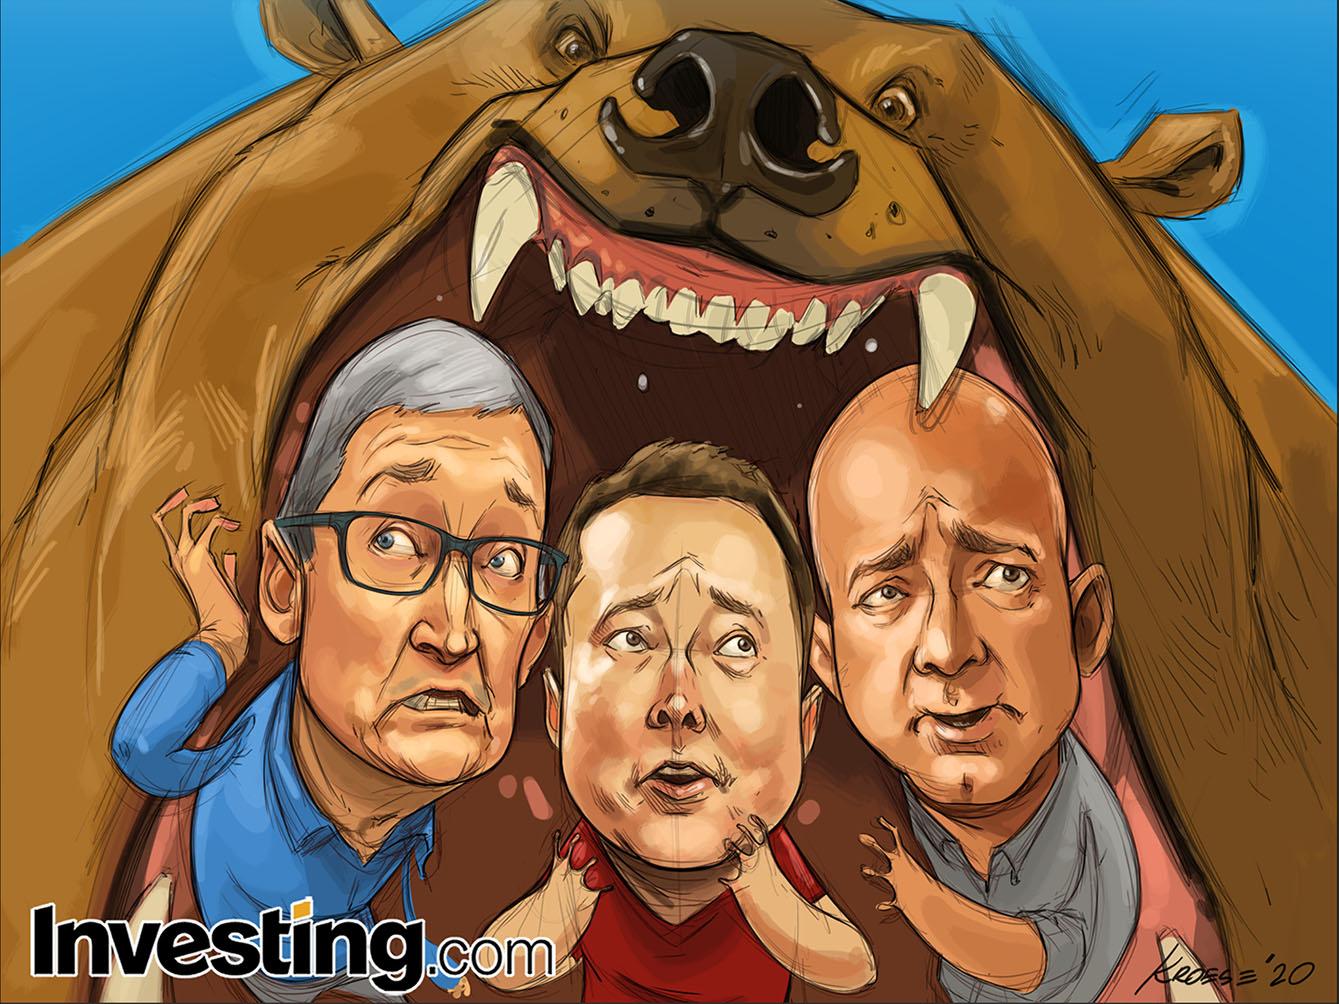 Tech-Led Selloff Leads To Nasdaq Correction As Tesla, Apple Push Markets Lower